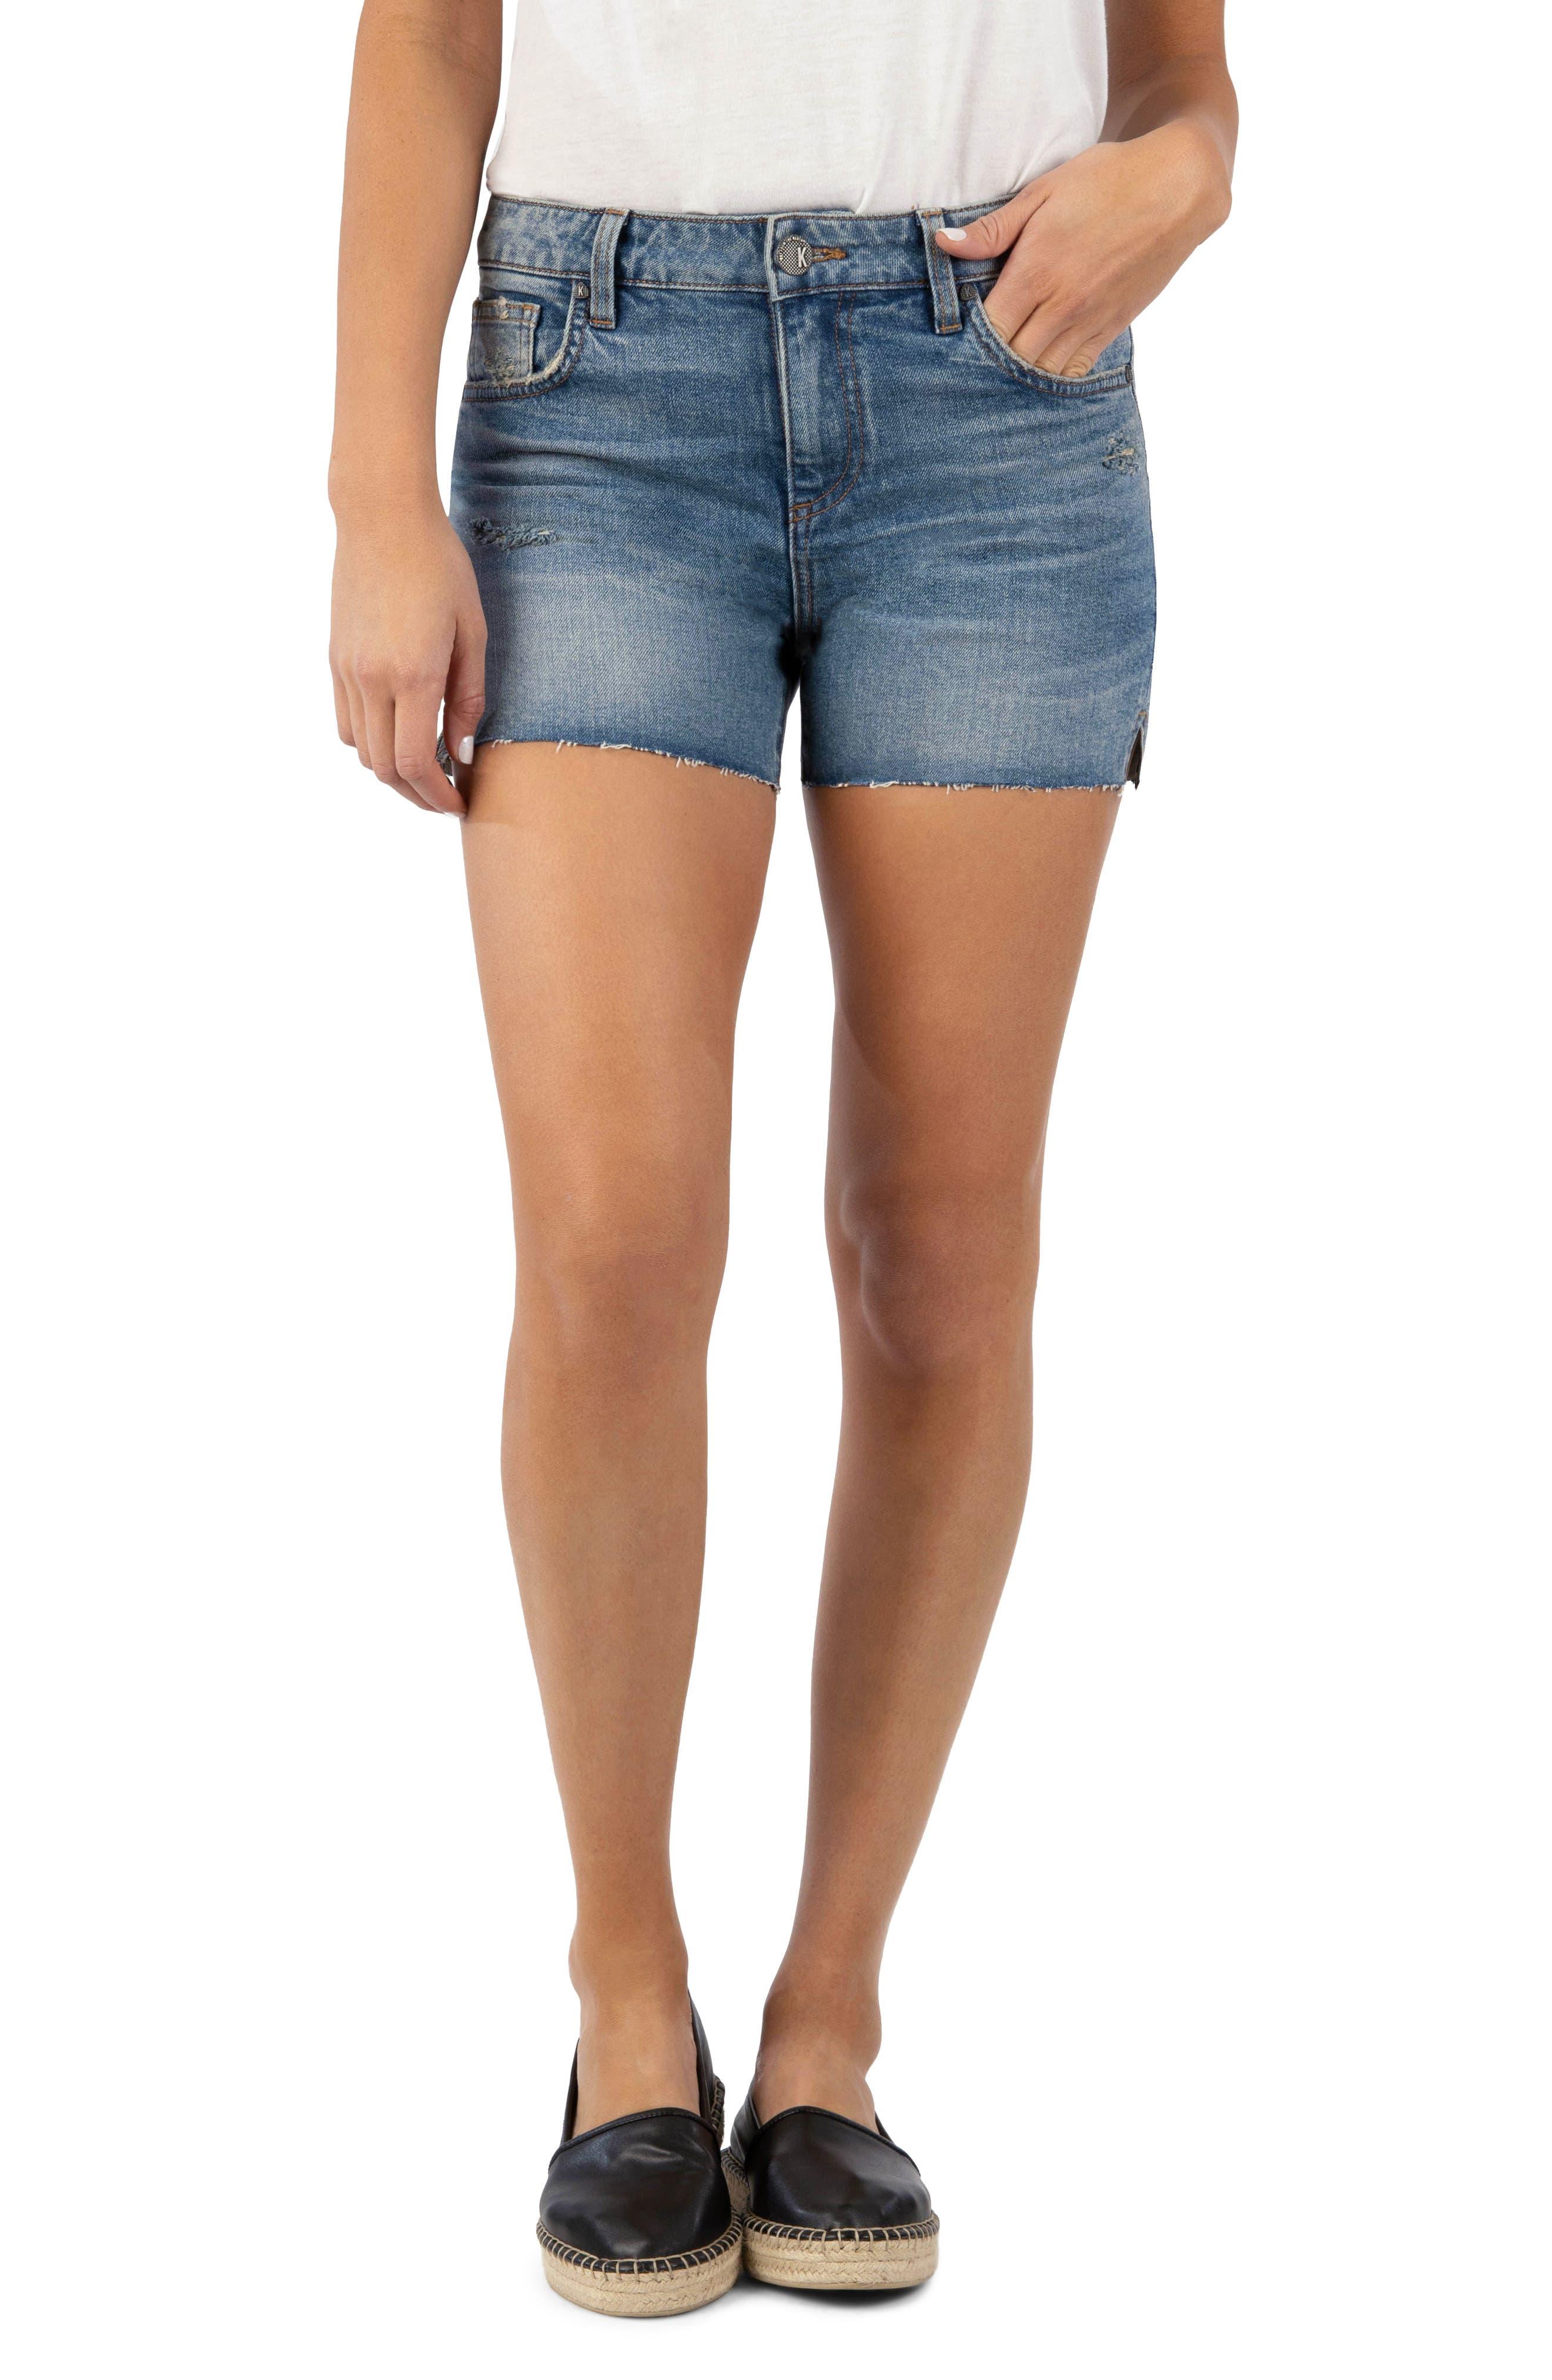 Gidget Distressed High Waist Denim Shorts